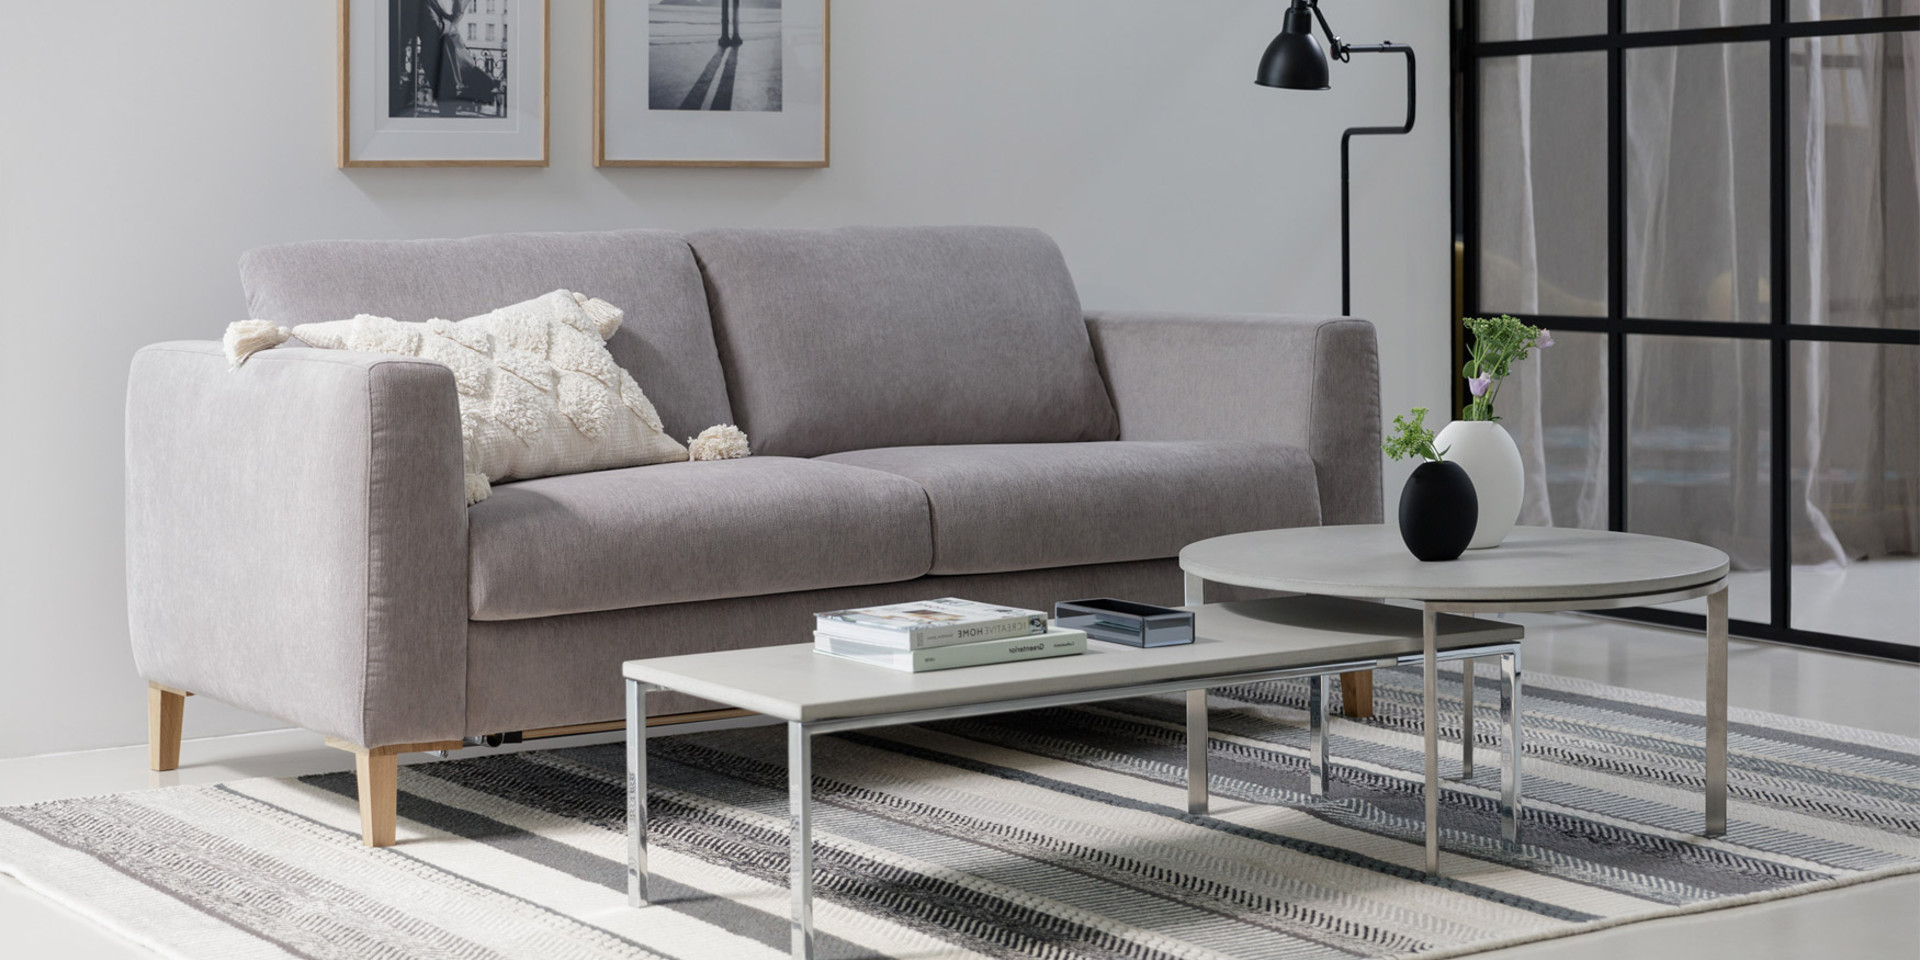 Sofa rozkładana sits henry internity home